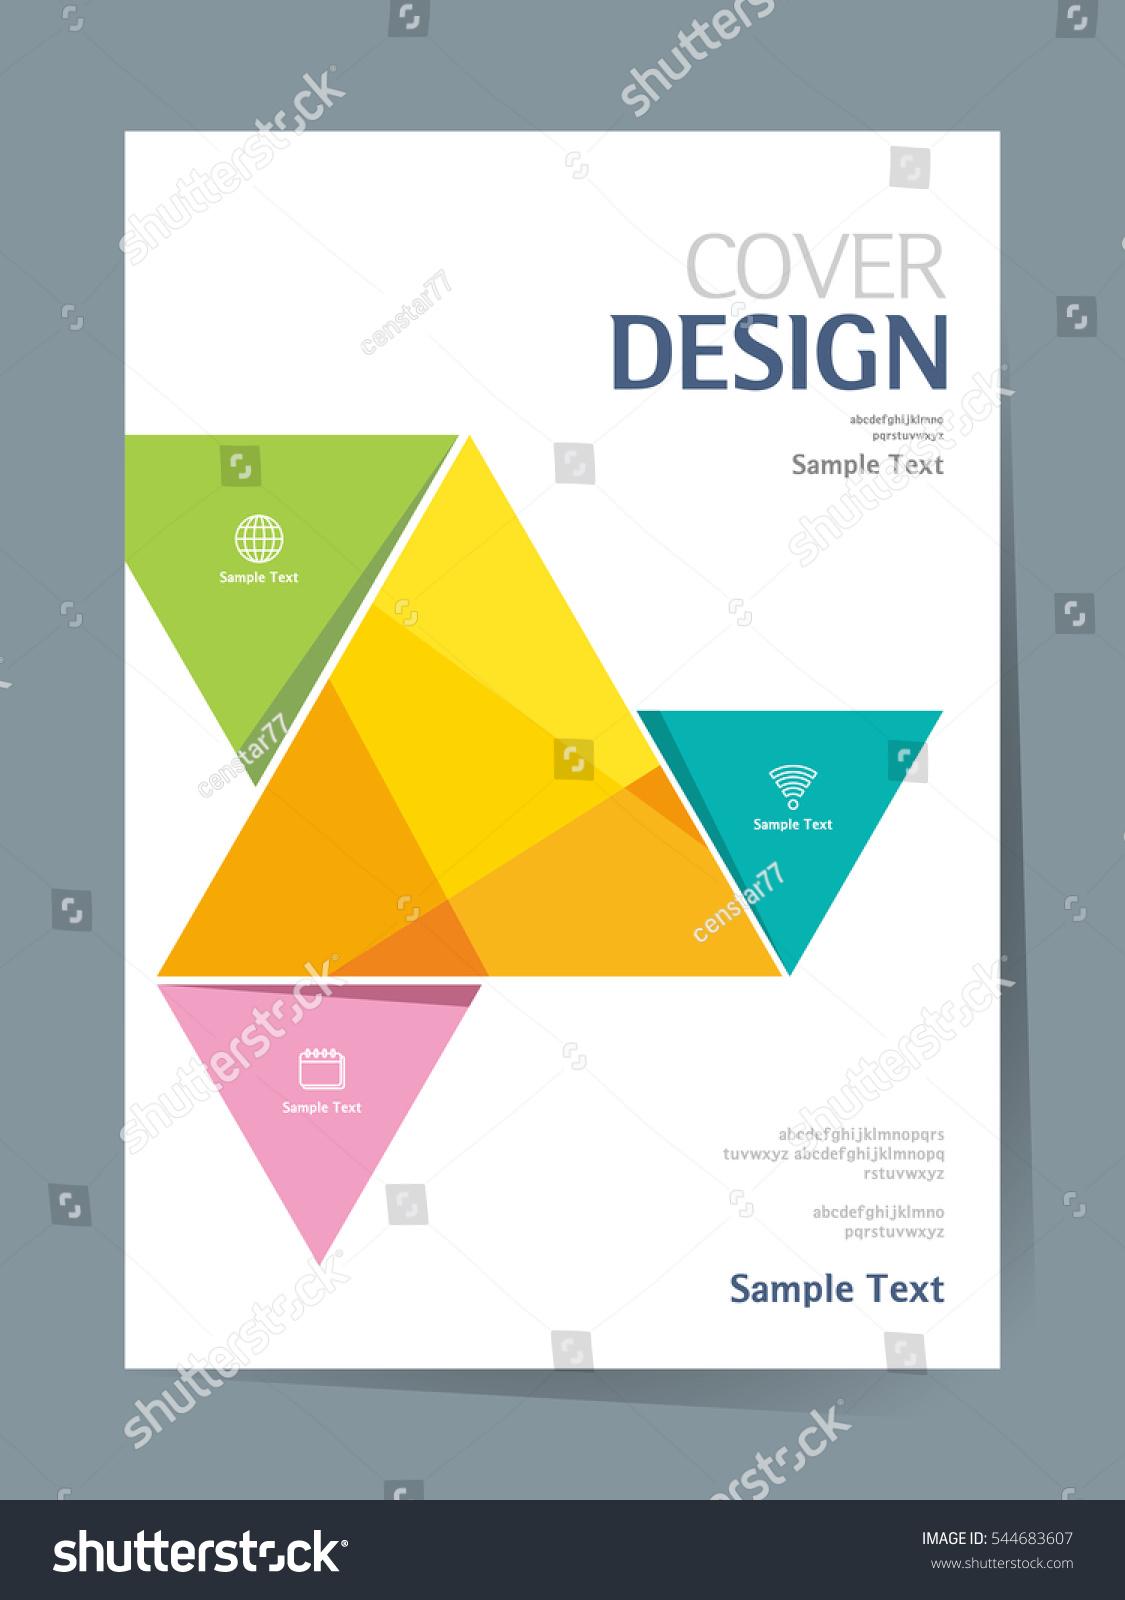 Simple Book Cover Design Template : Book cover design vector template a stock